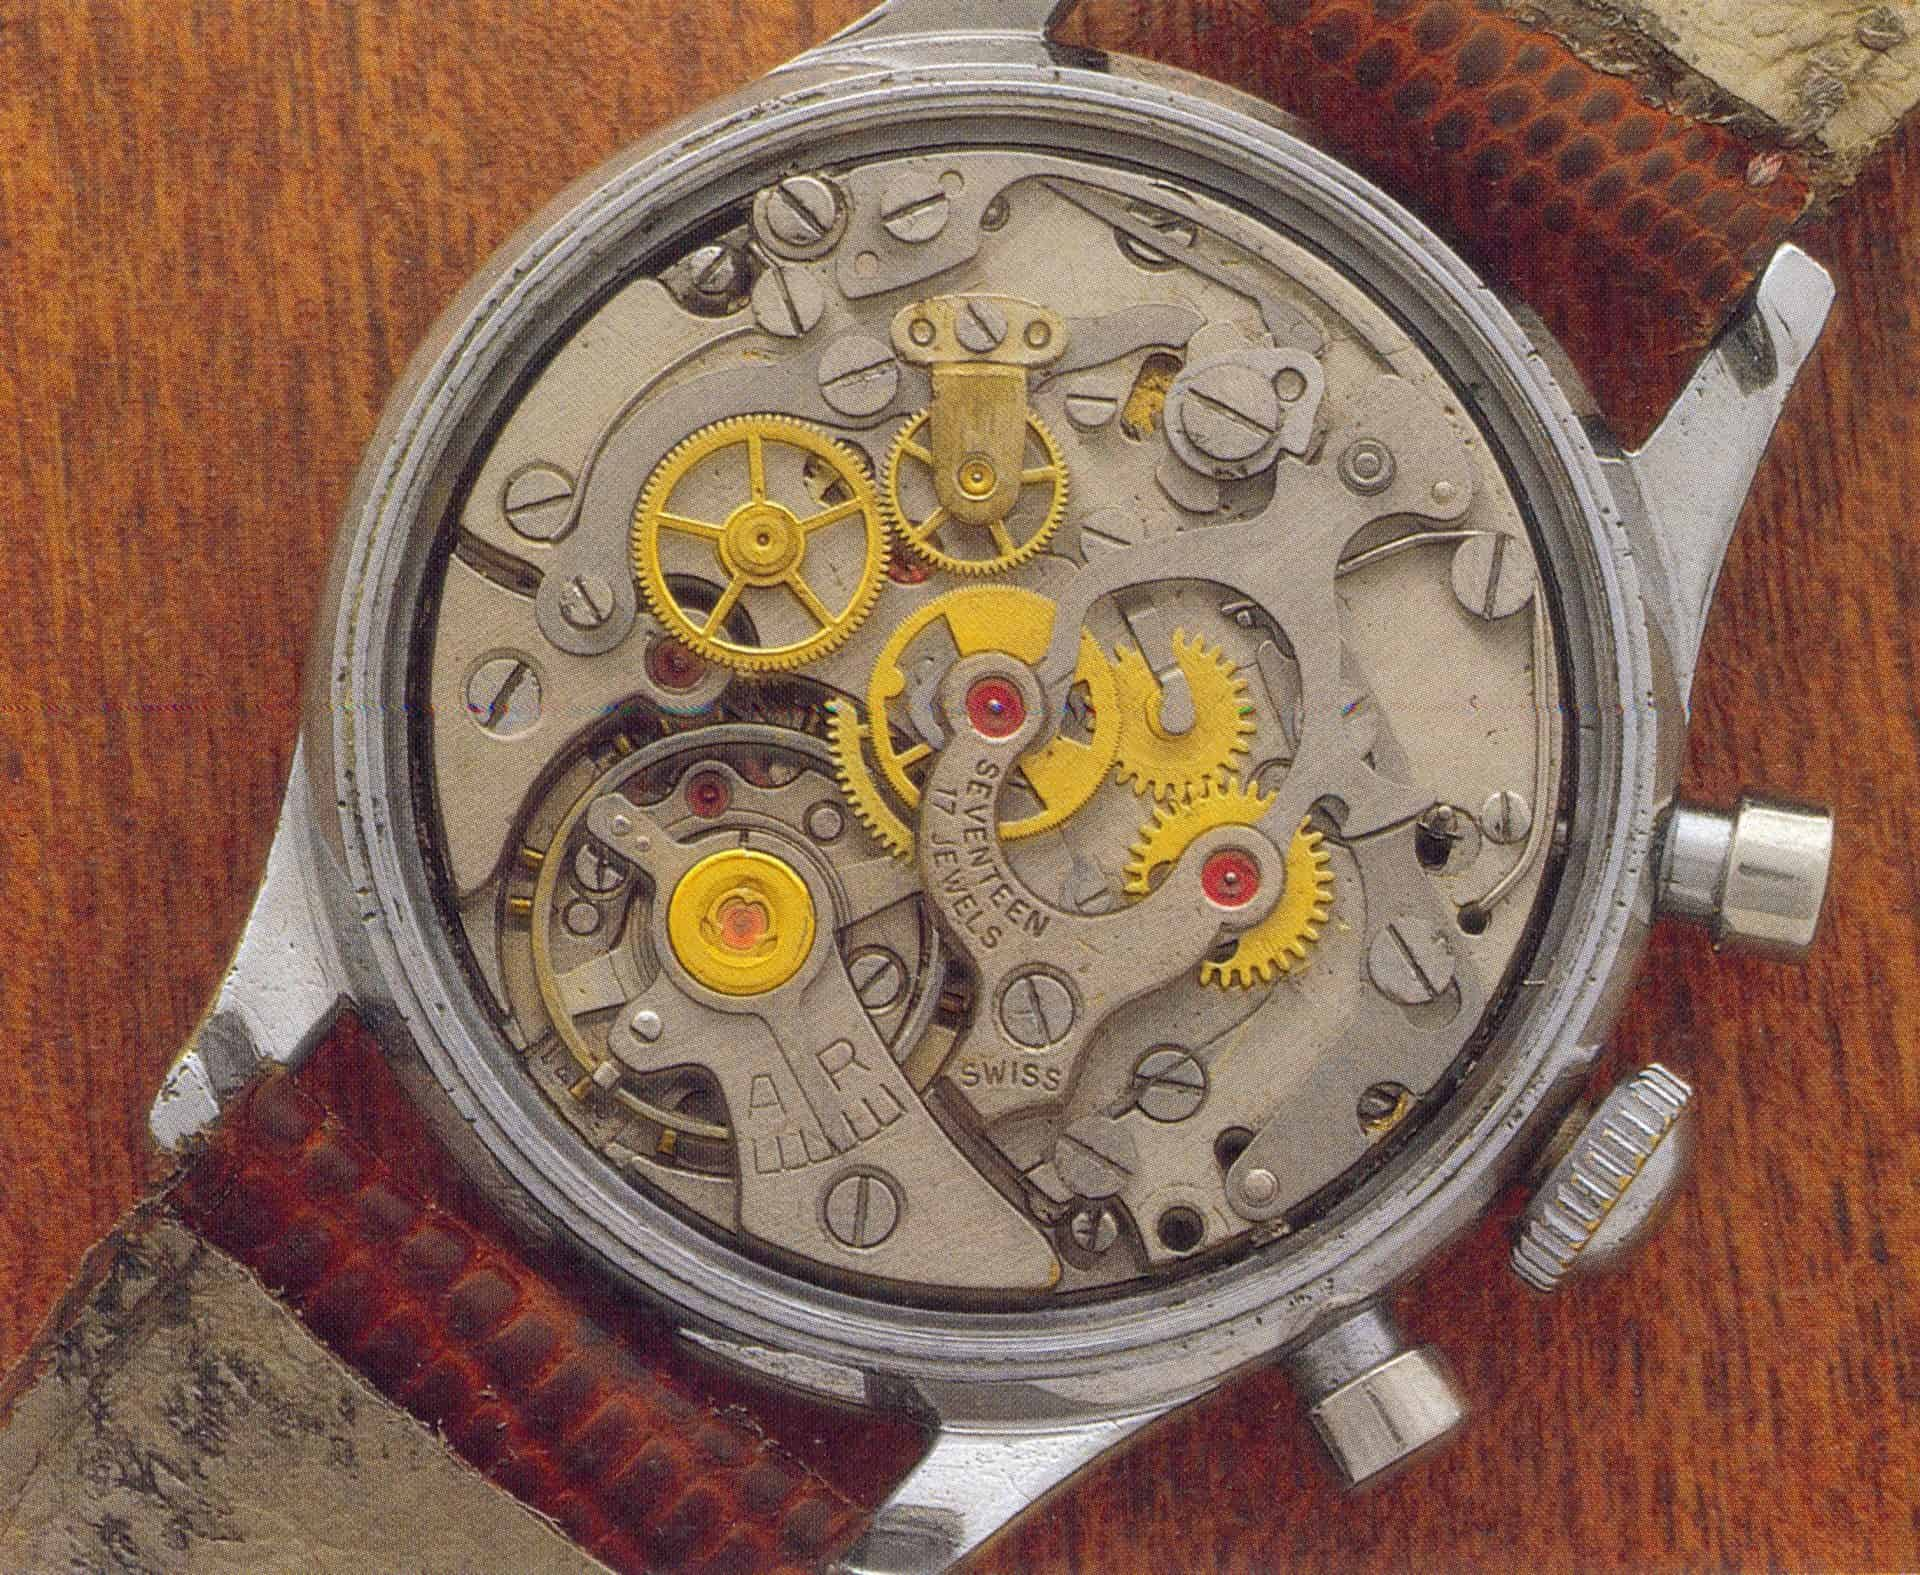 Das Kaliber des Lemania Chronographen 1270 Bild Expertswatches